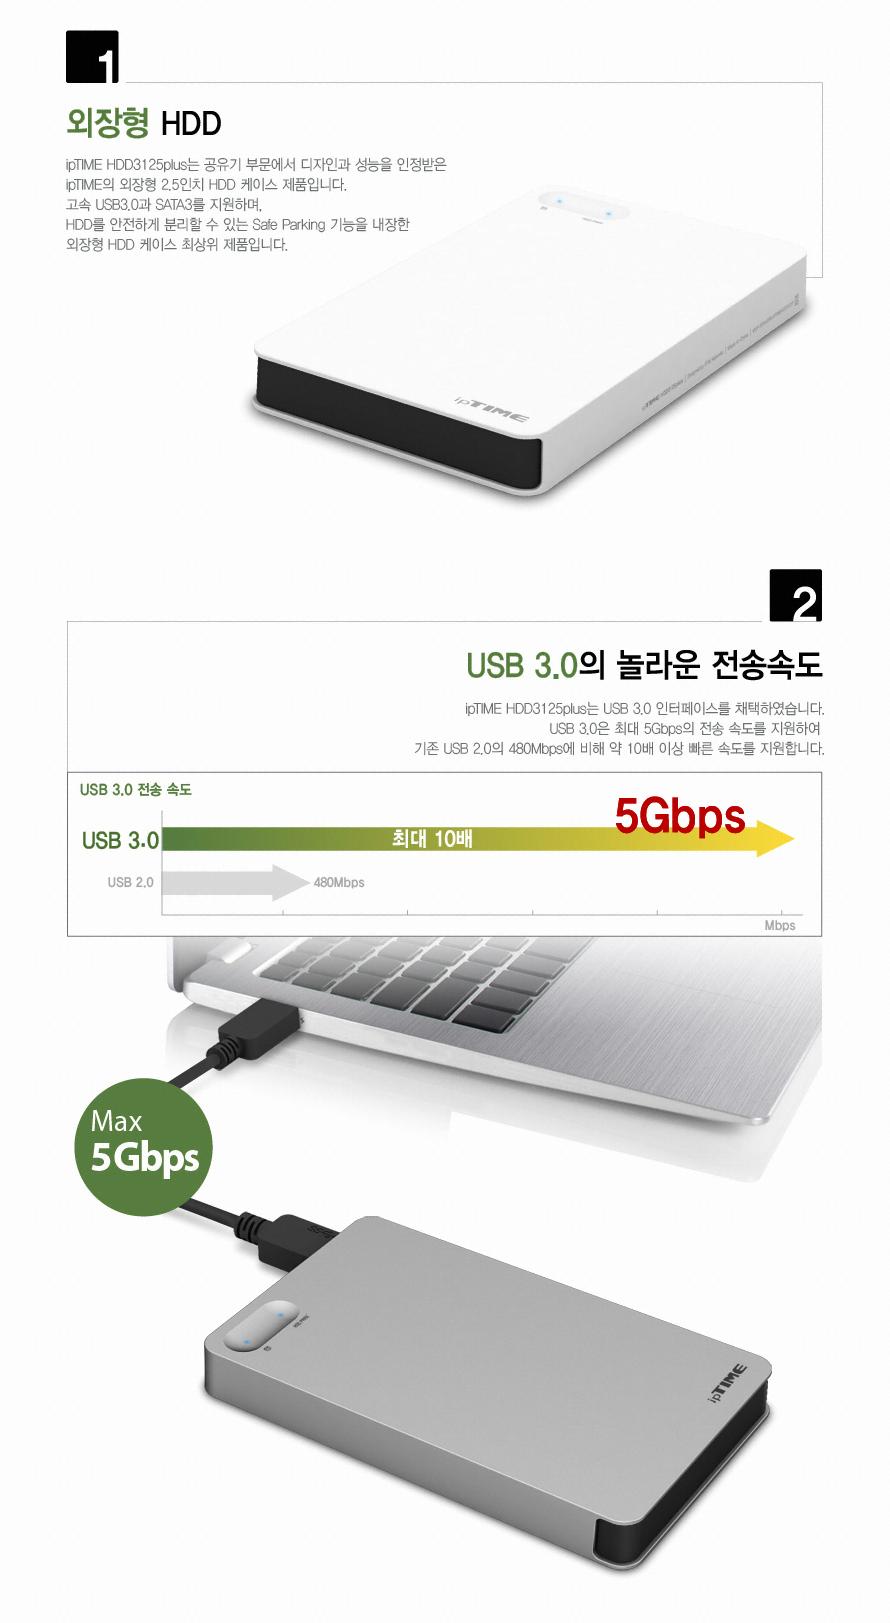 EFM ipTIME HDD 3125 Plus (160GB)